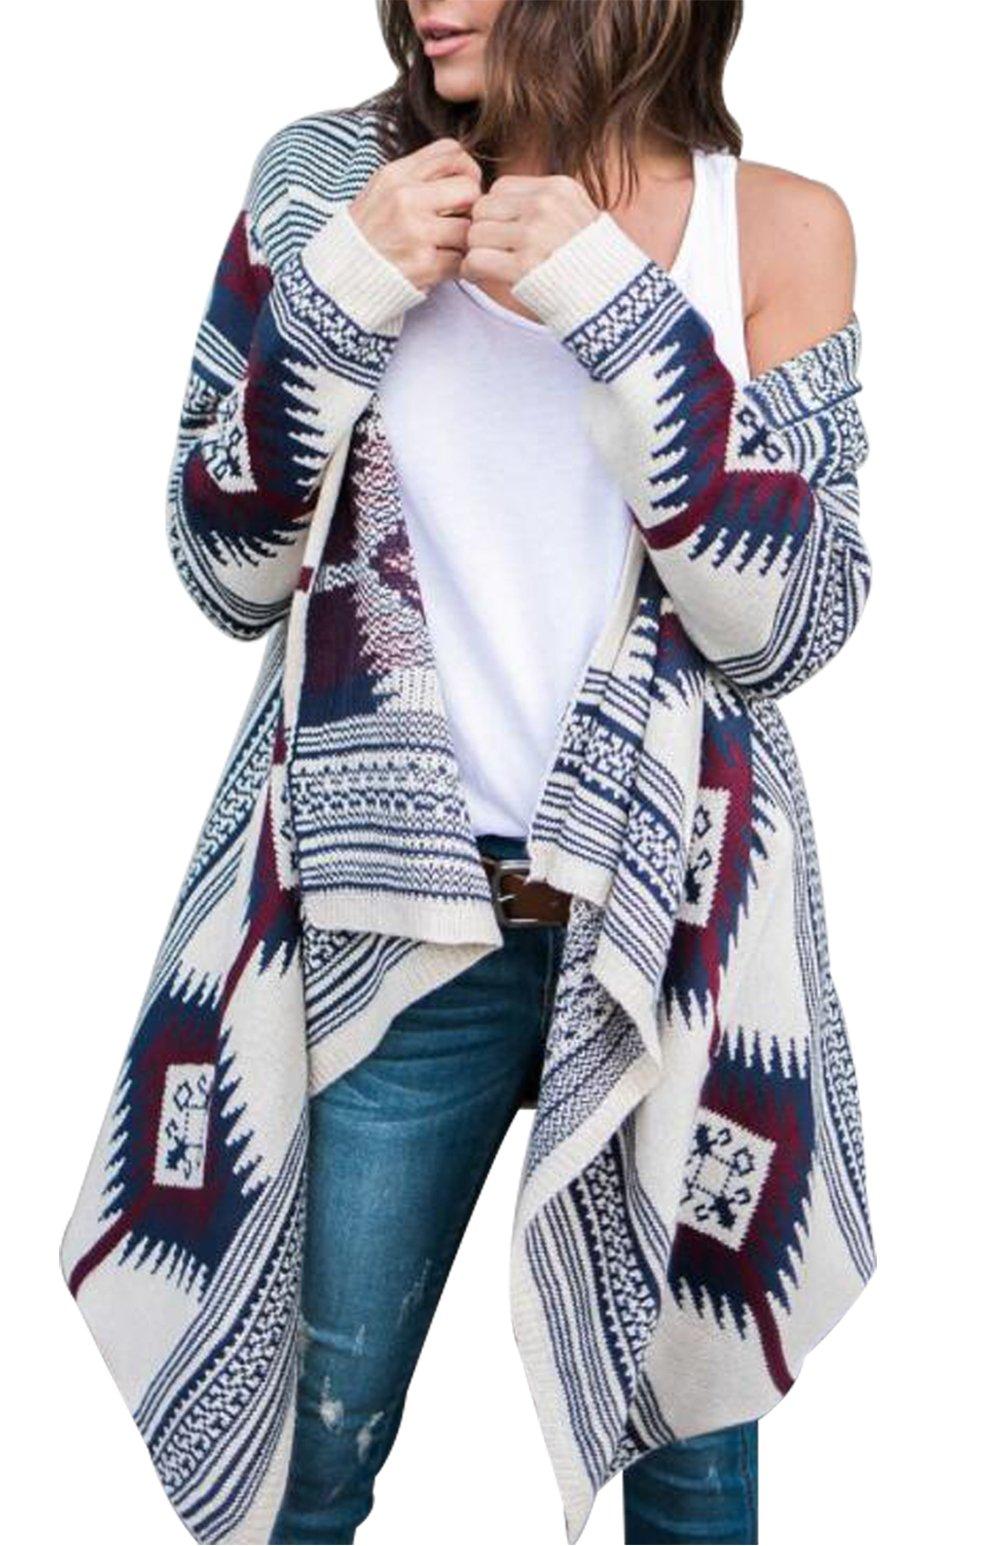 MAXIMGR Womens Geometric Irregular Hem Shawl Collar Open Front Outwear Cardigan Coats Size L(US 6-8) (Blue)